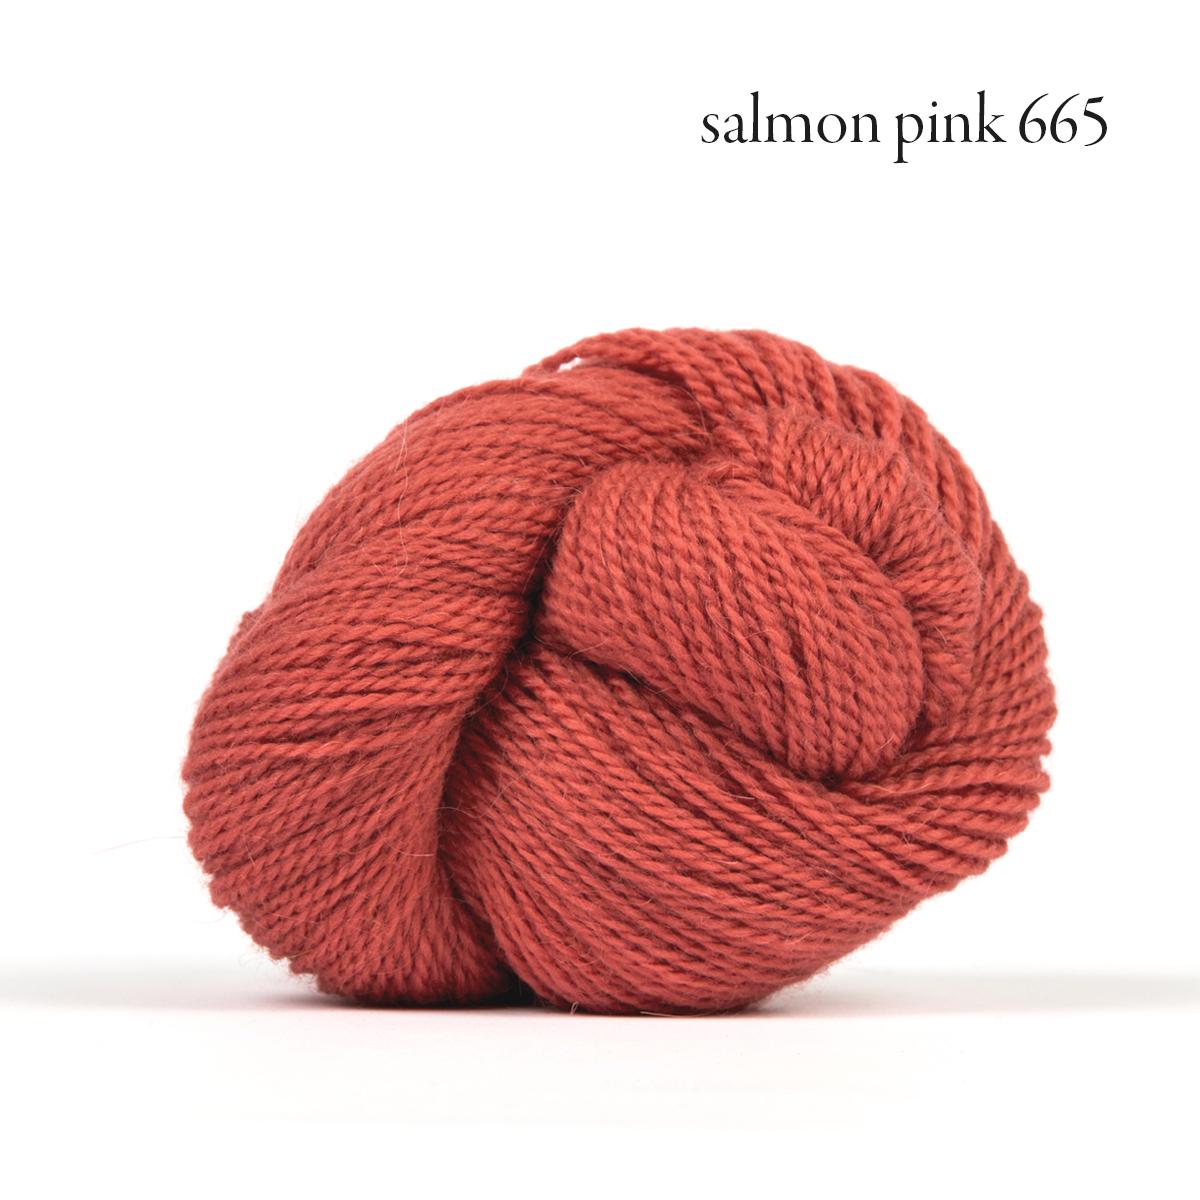 Andorra salmon pink.jpg